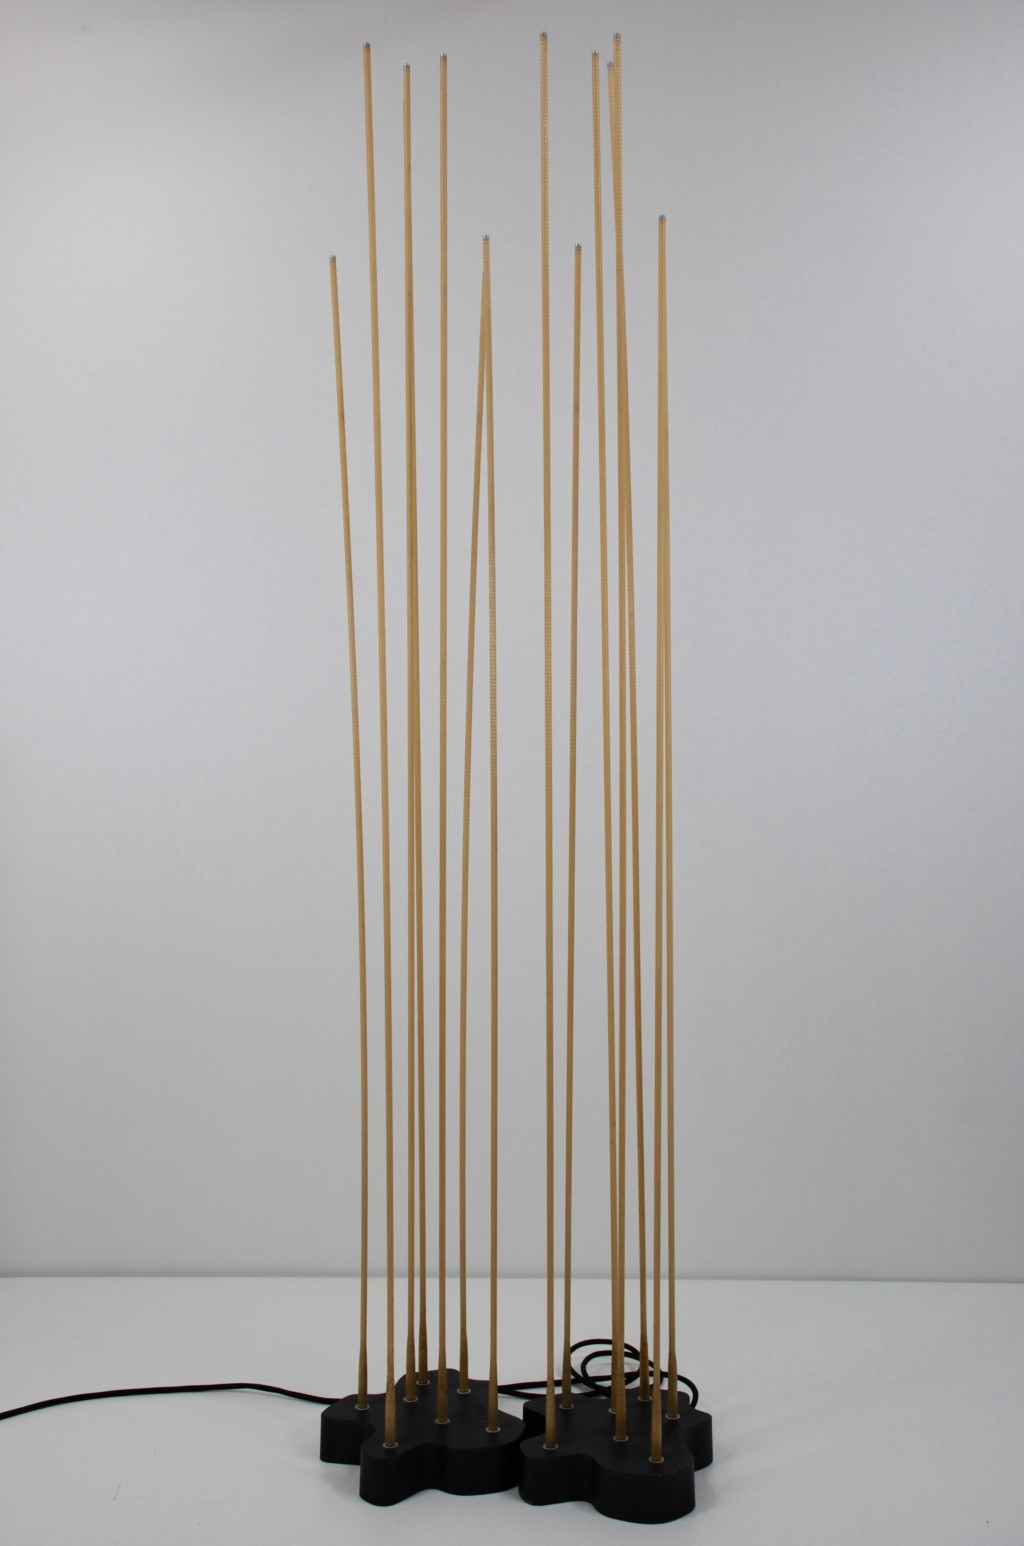 Stehleuchte 'Reeds', Klaus Begasse um 2004